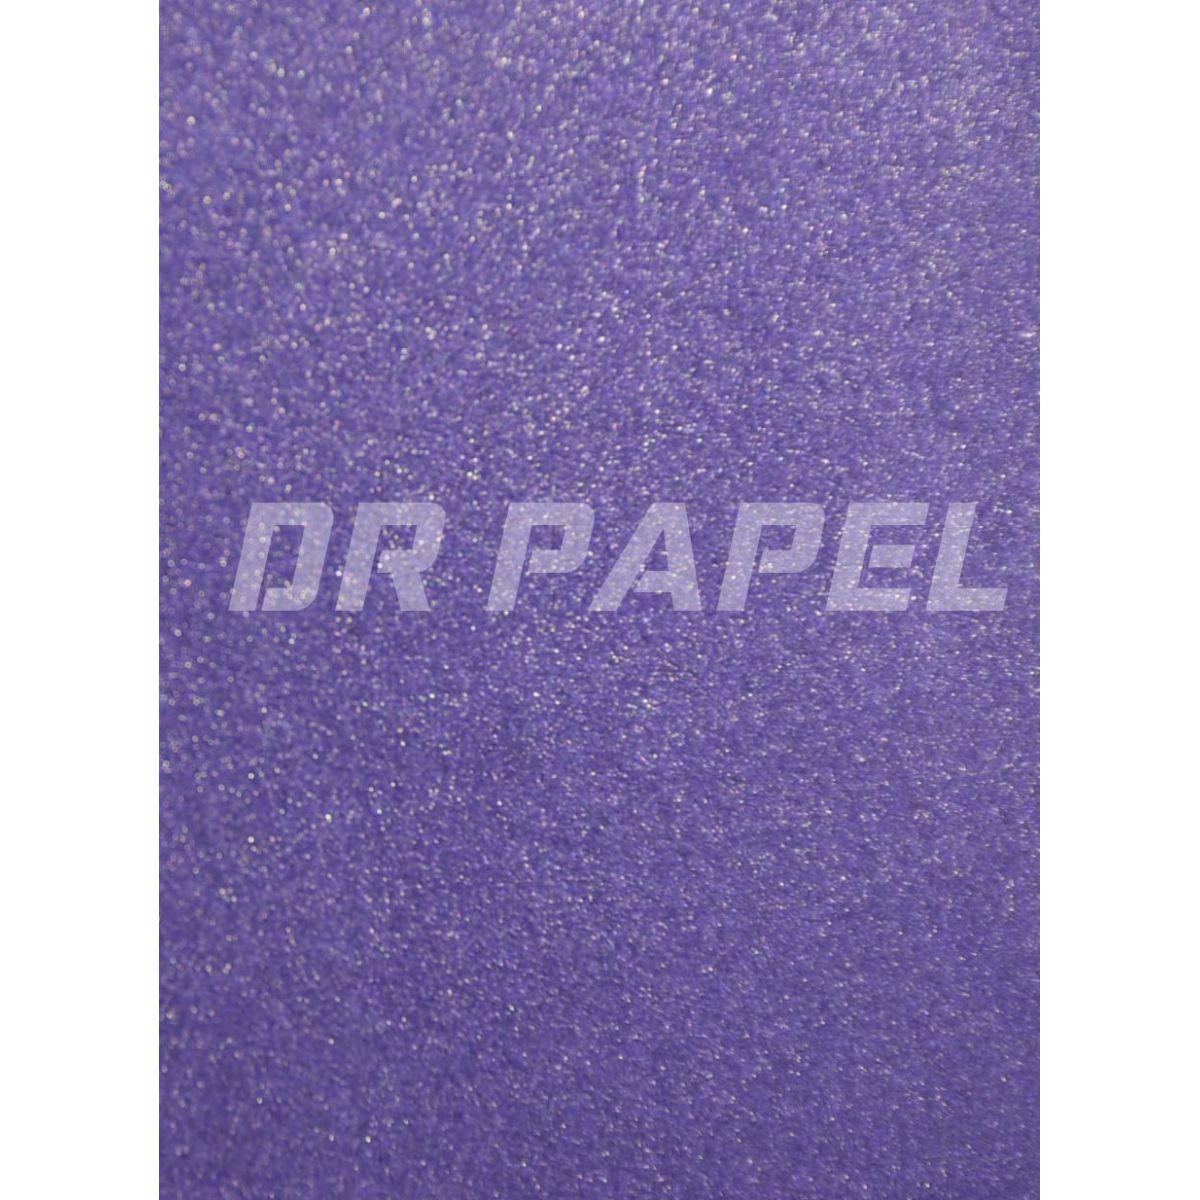 Curious Metallics Violette - 120g / 300g